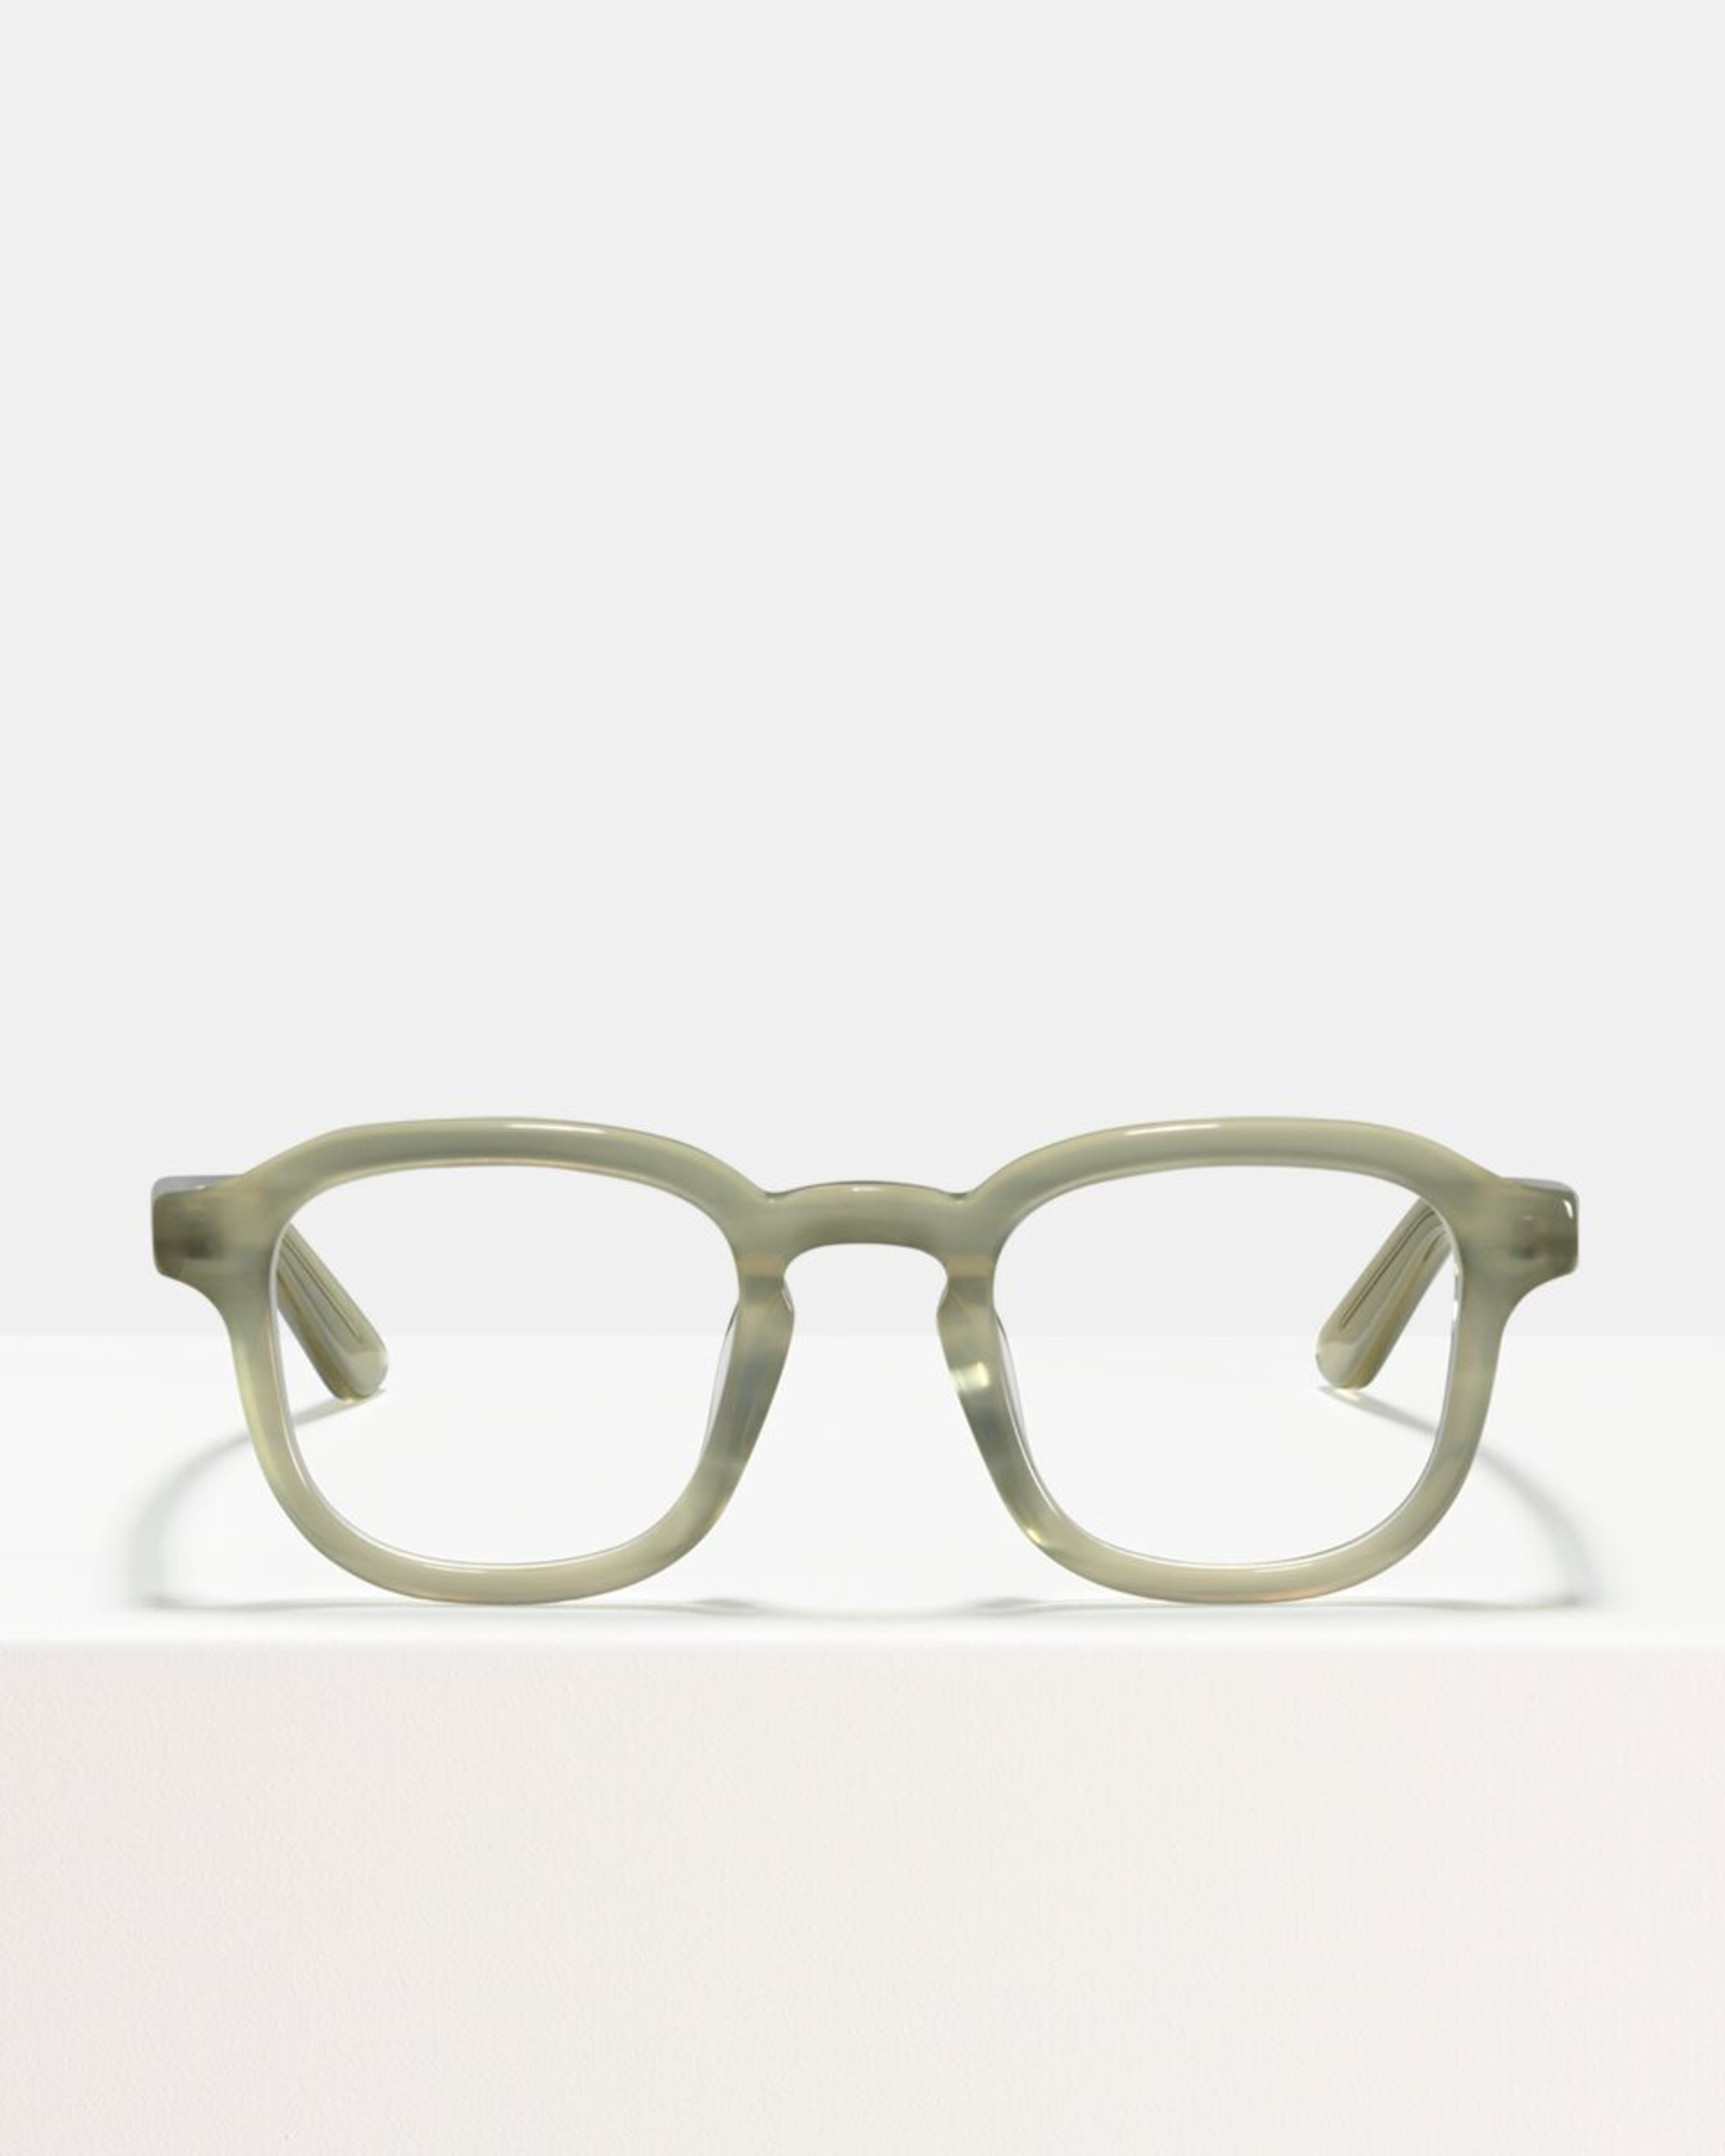 Ace & Tate Glasses | vierkant acetaat in Grijs, Wit